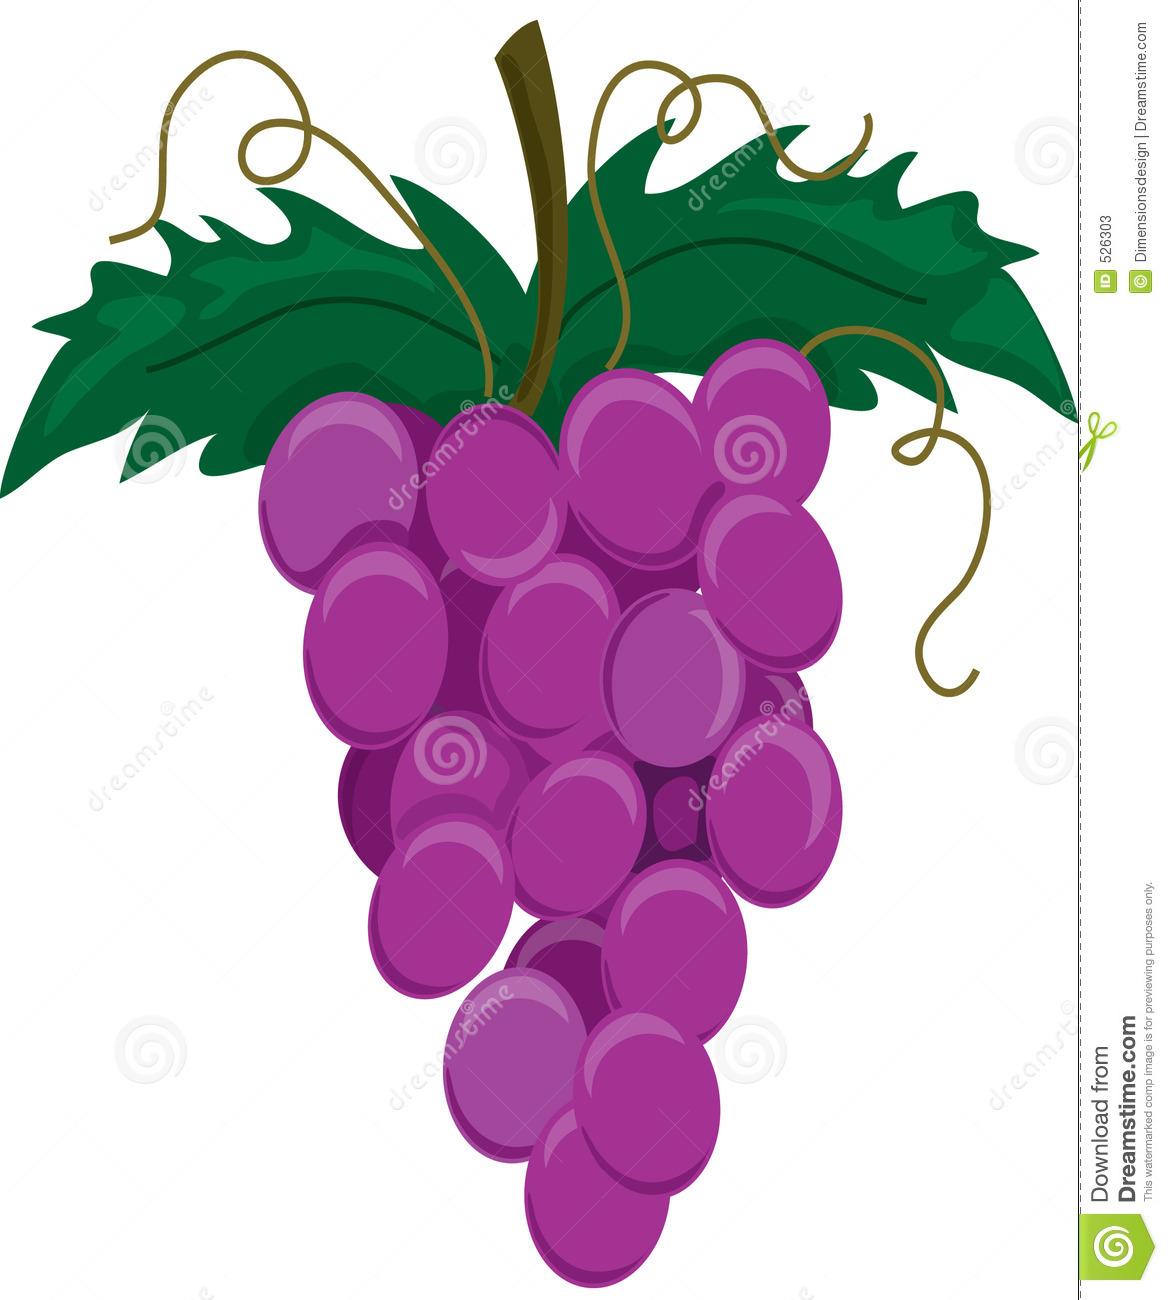 Grape clipart pruple. Purple grapes free download